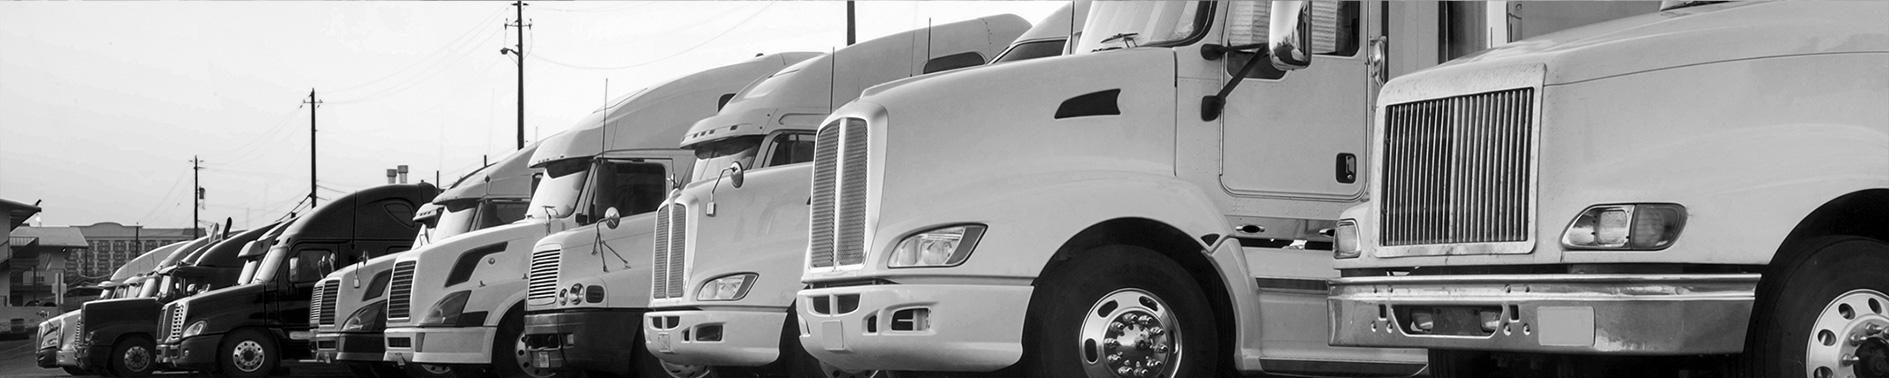 Semi Trucks FMP Fleet Supply Chain Solutions